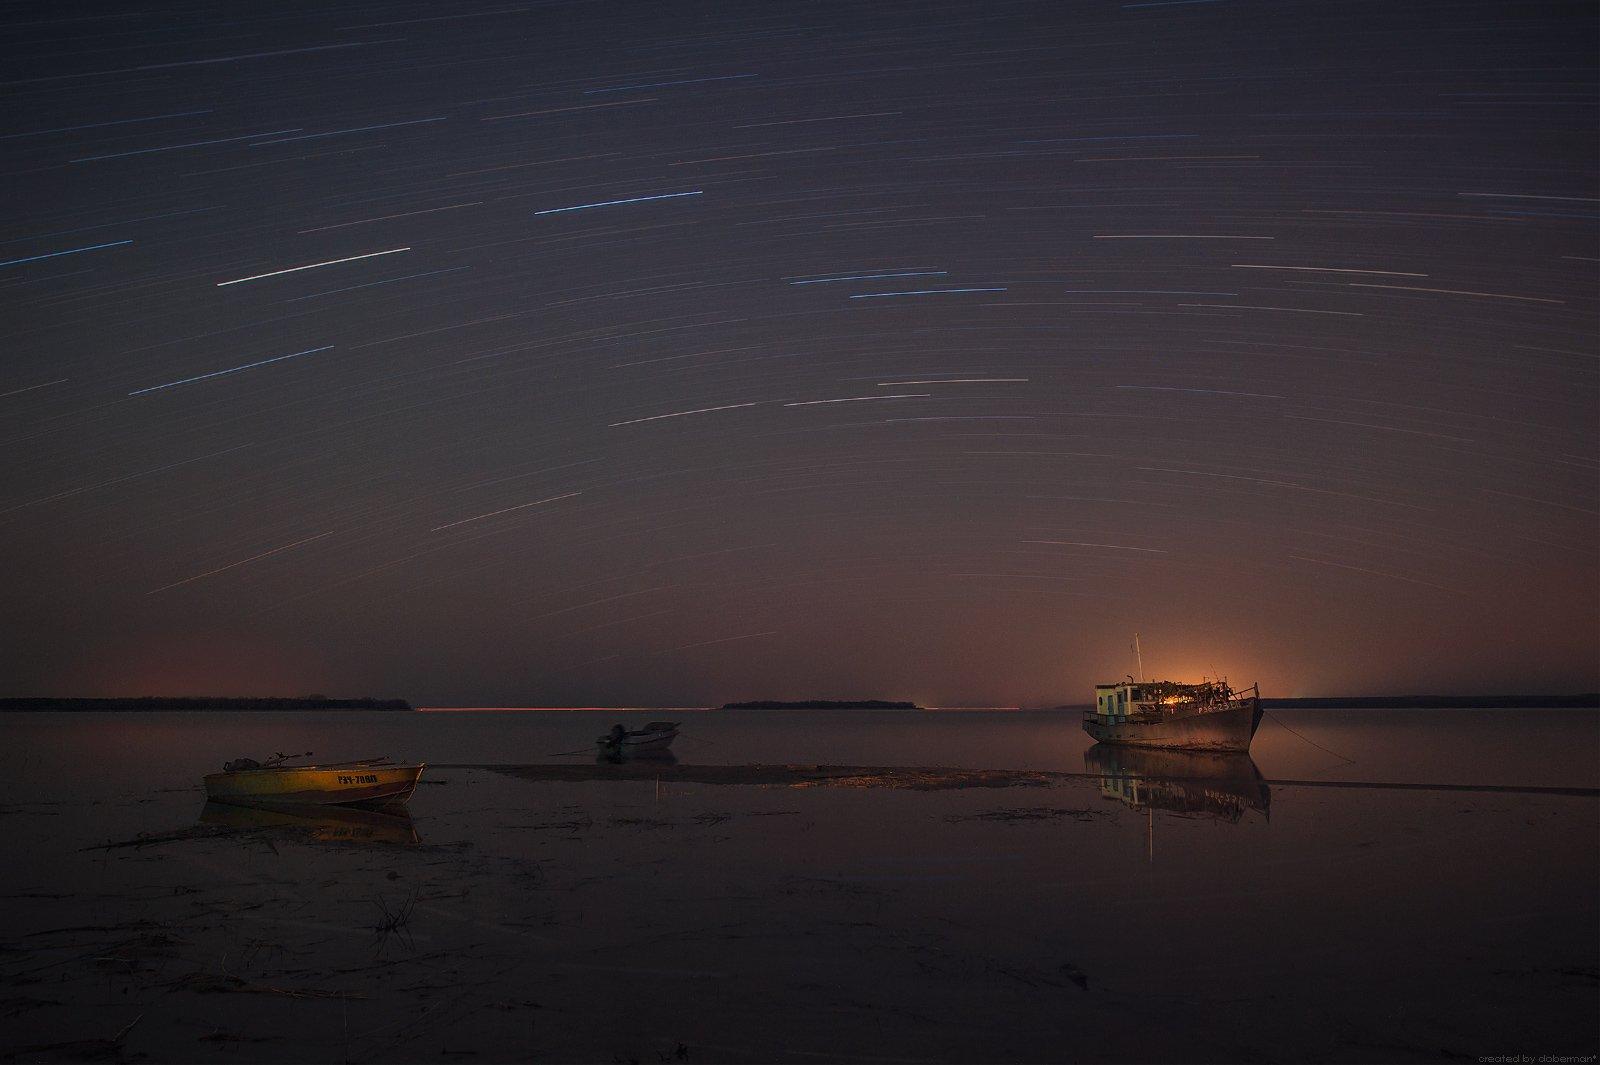 длинная выдержка, ночная съемка, звезды, вода, лодка, треки, doberman